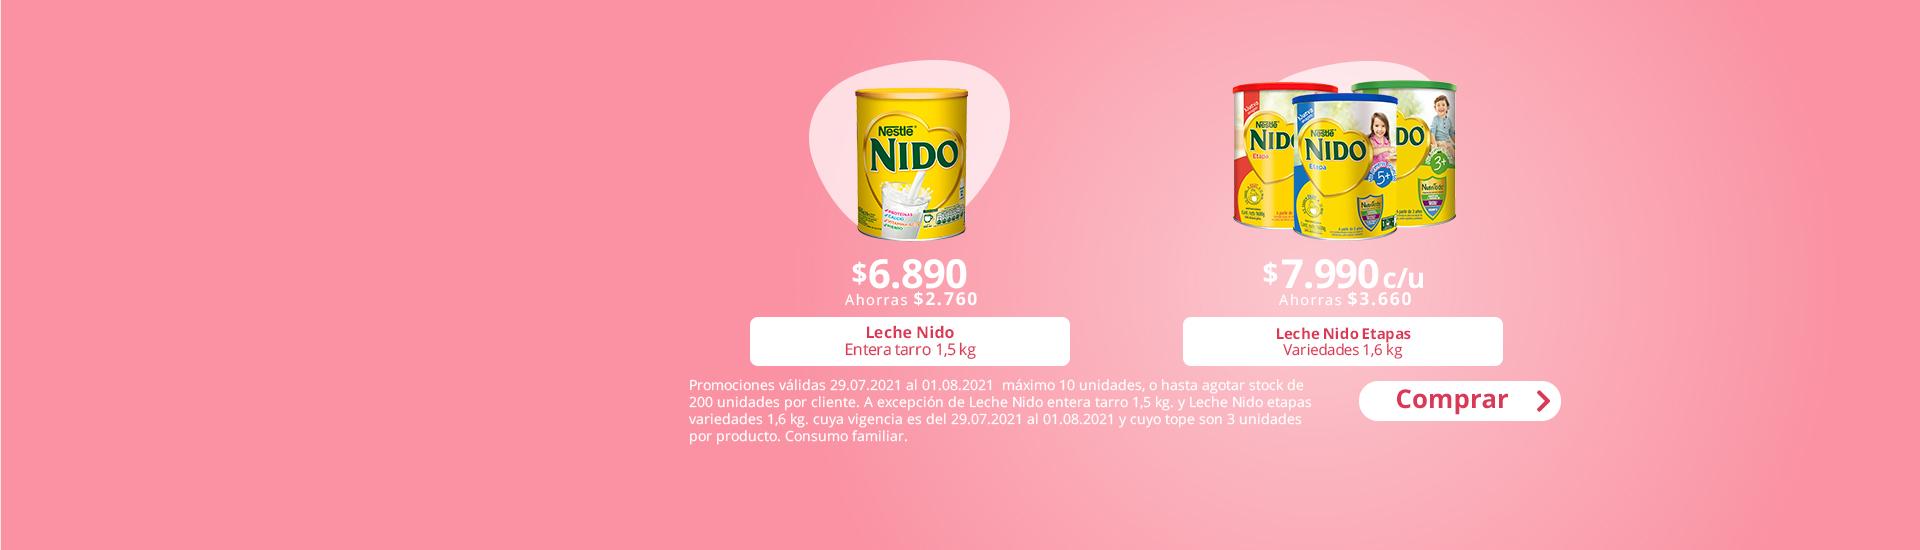 Leche Nido